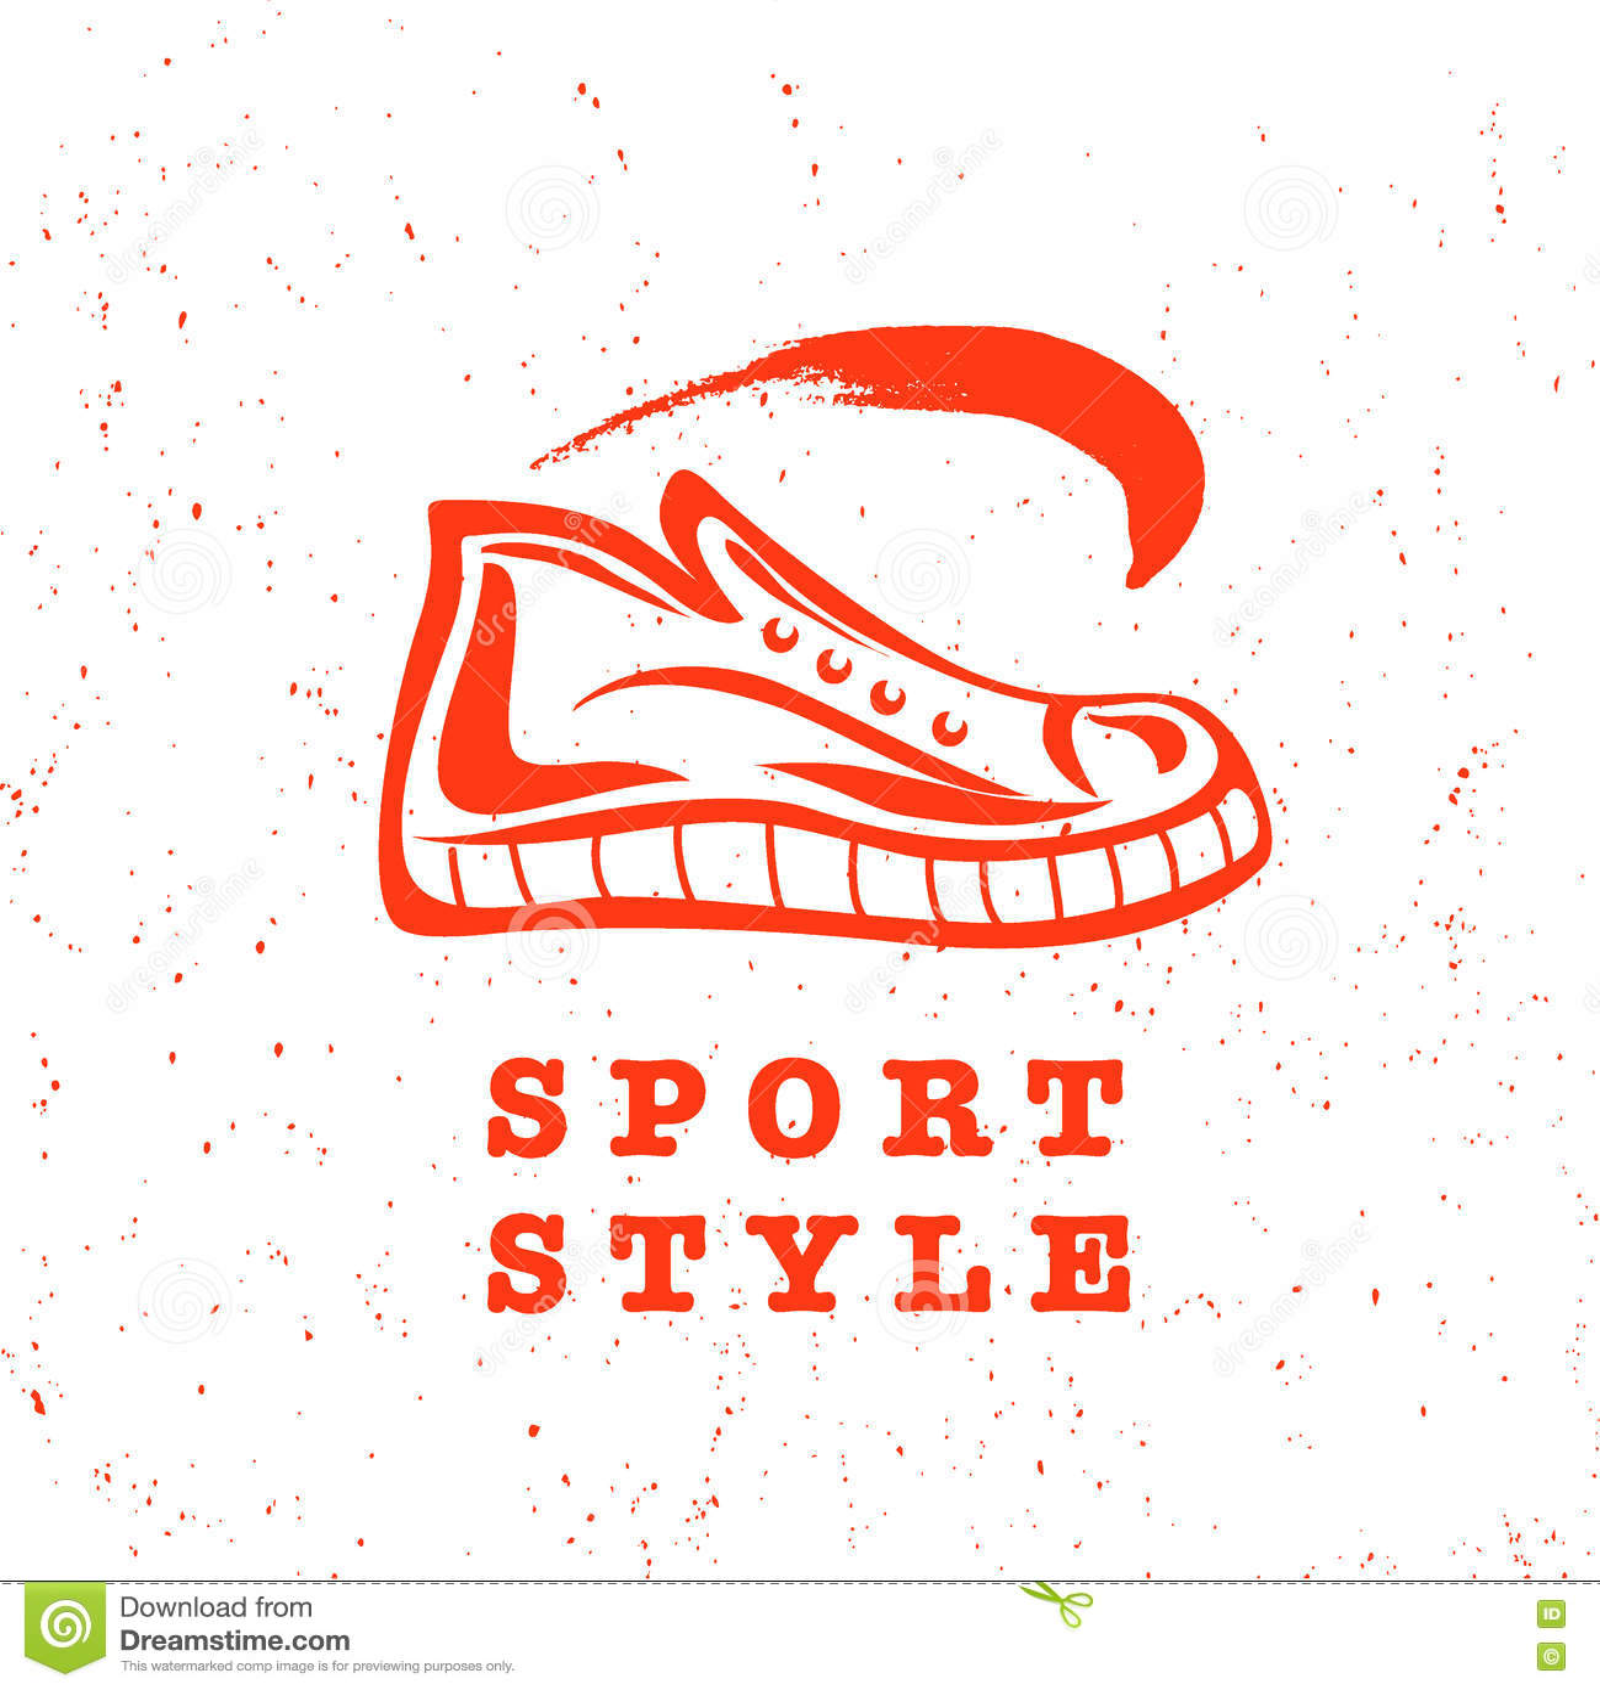 Logo plat de marque de marque de chaussure de sport de vecteur download logo plat de marque de marque de chaussure de sport de vecteur illustration de vecteur altavistaventures Gallery